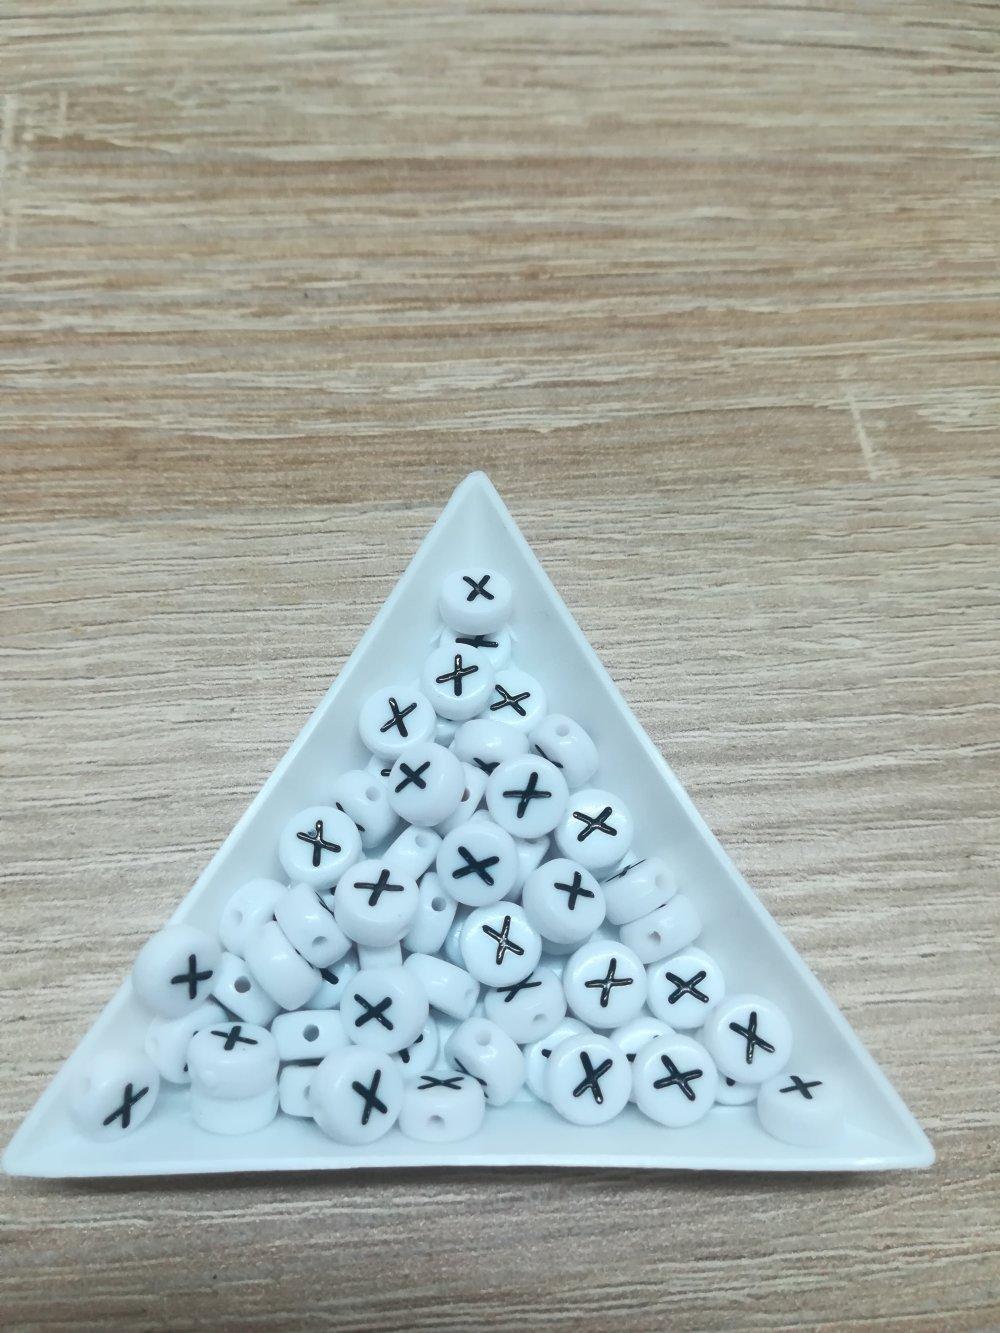 l lot de 10 perles lettres X en acrylique